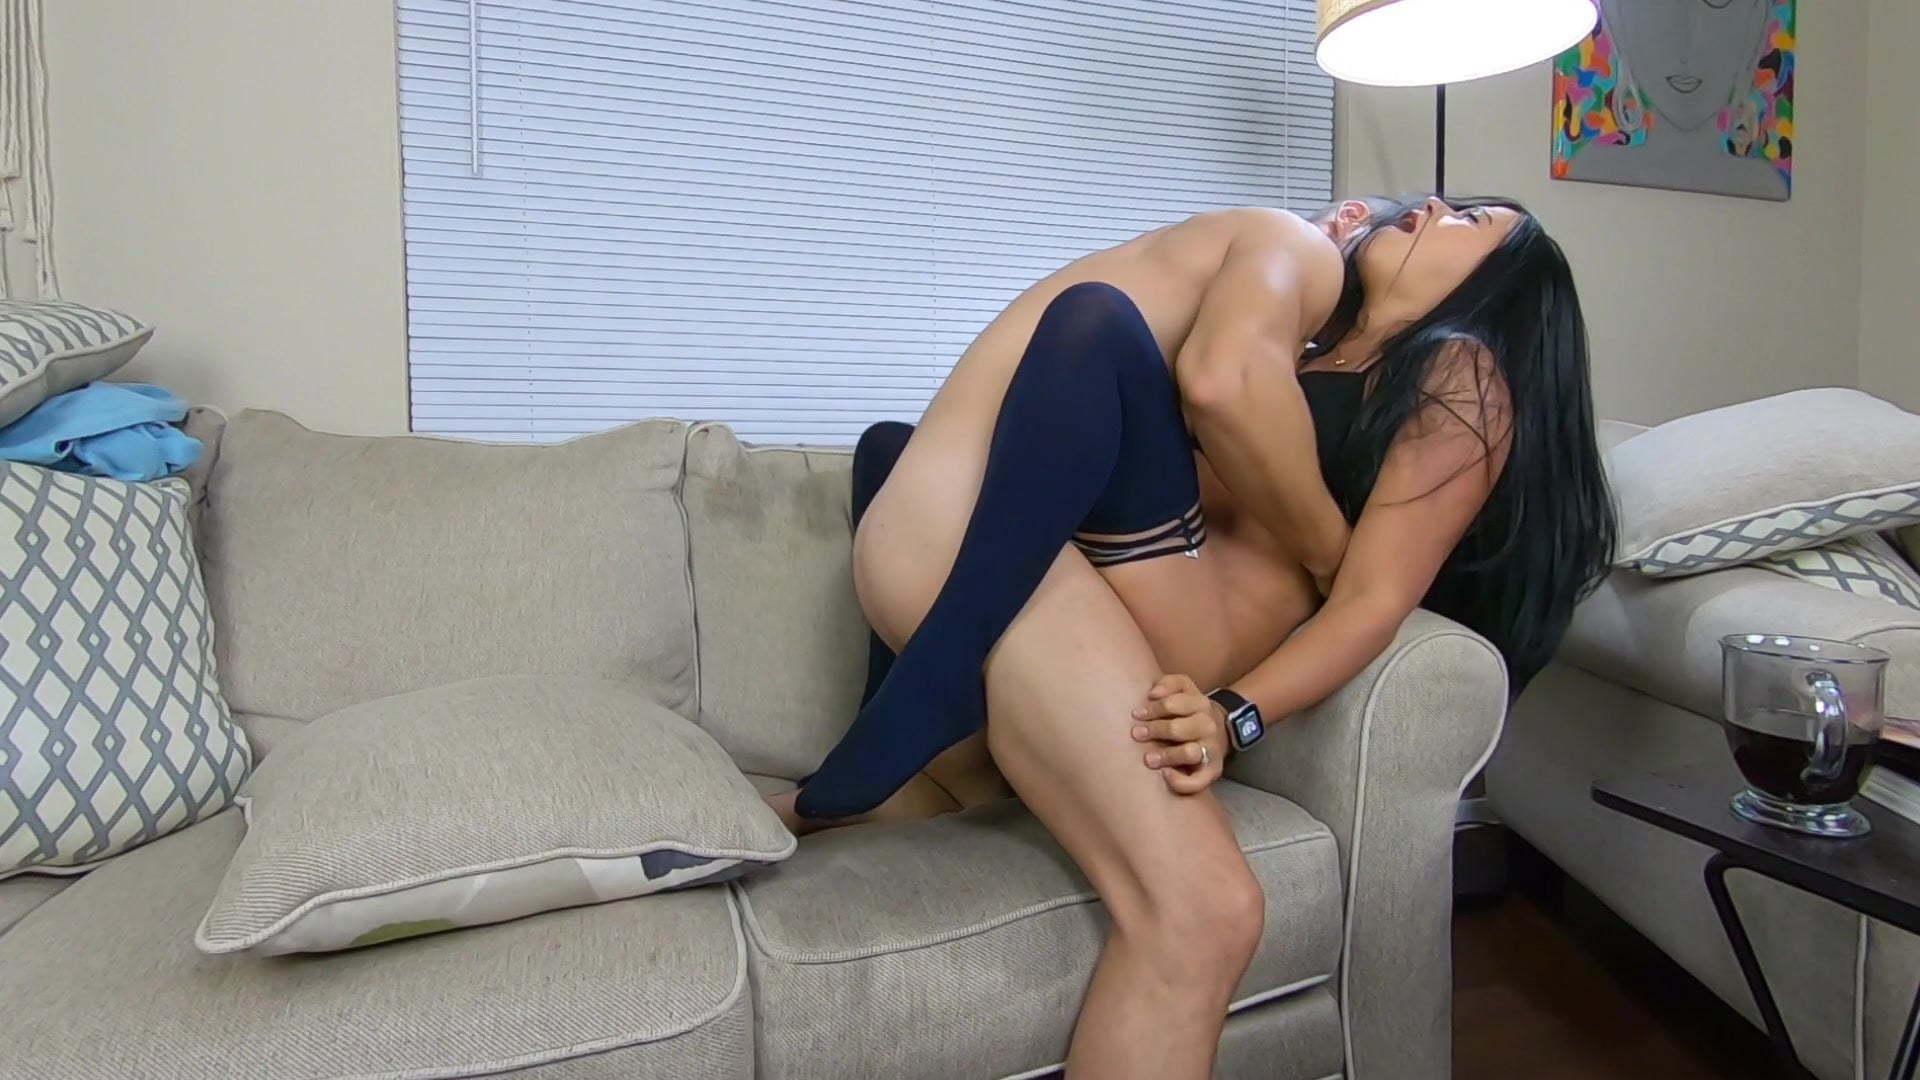 Amateur Seduce Porn amateur wife seduces husband on the couch